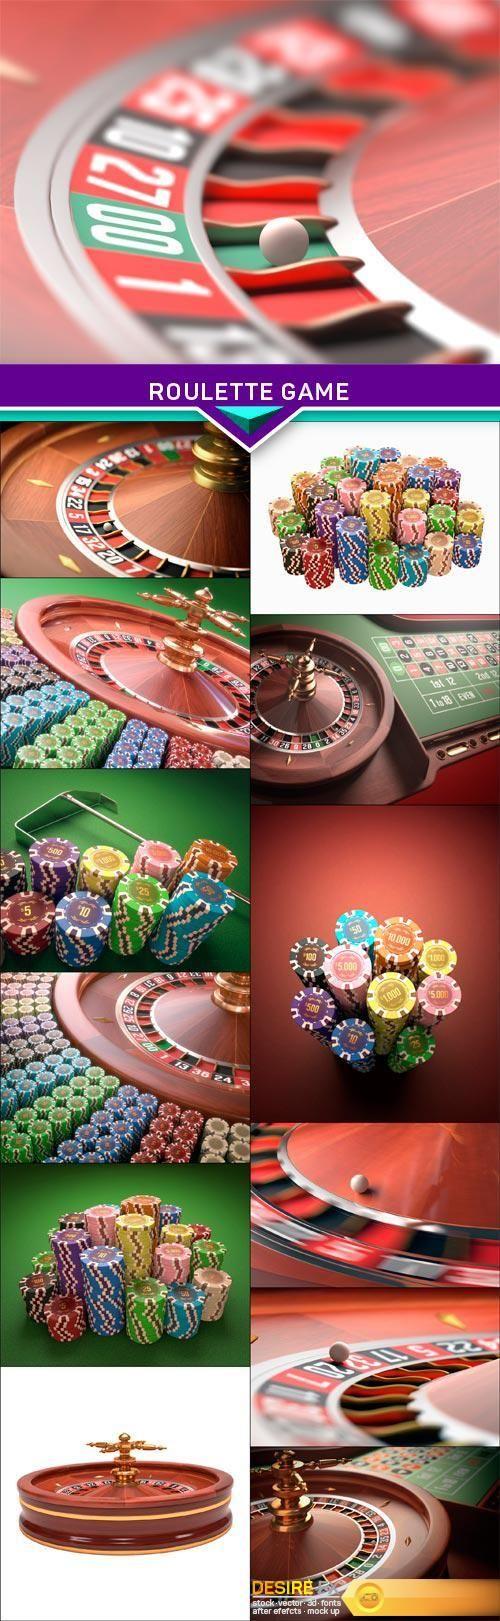 Wooden roulette buy black wooden roulette blackjack table led - Roulette Game 13x Jpeg Http Www Desirefx Me Roulette